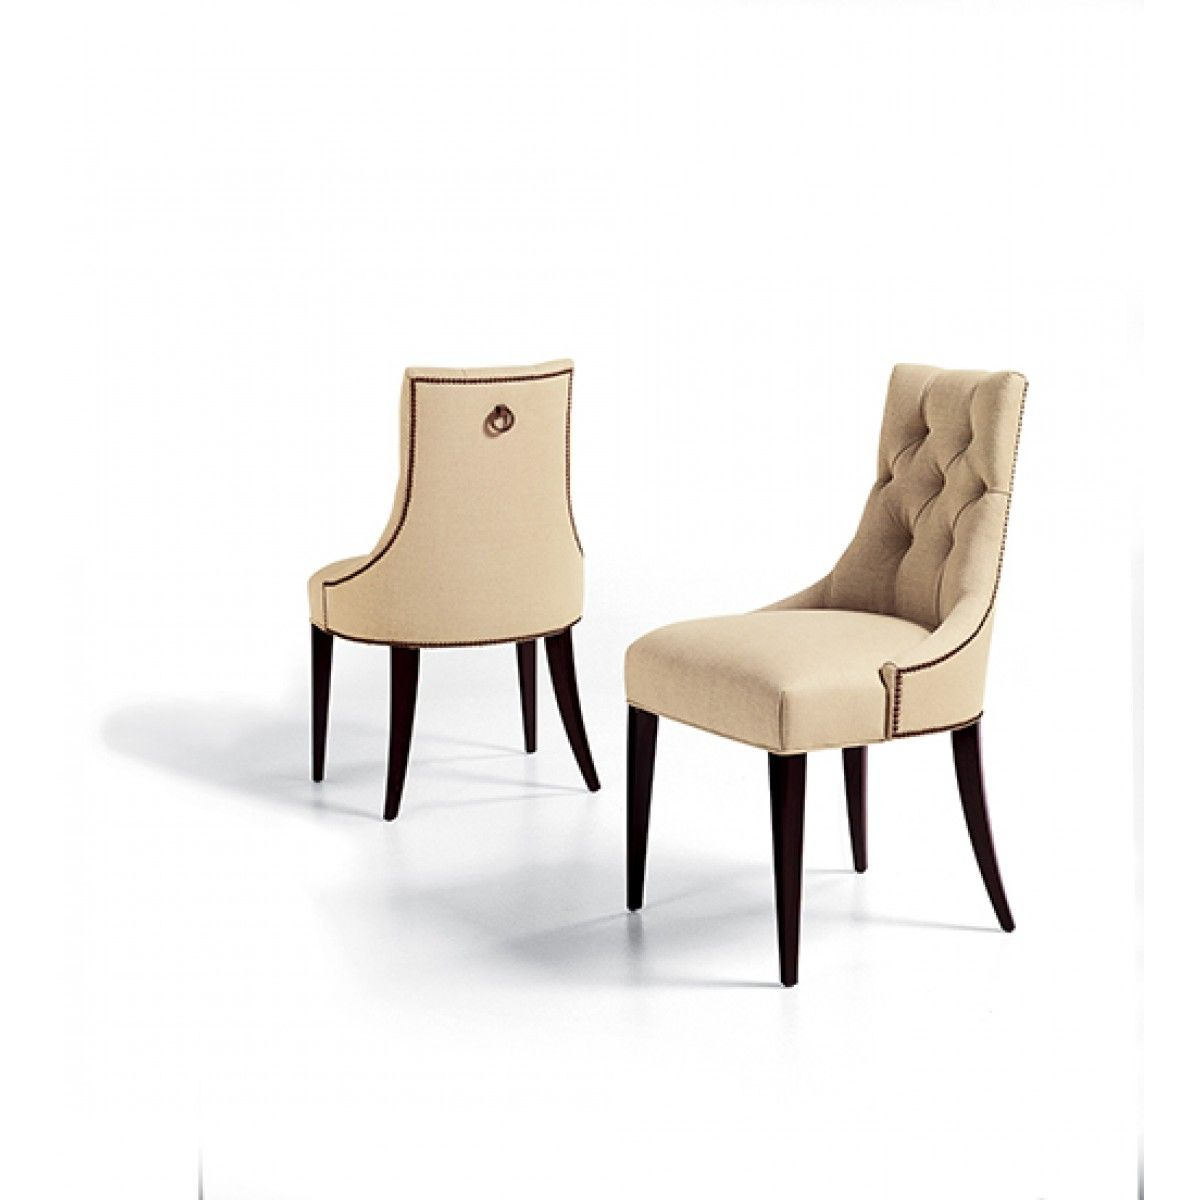 Baker Thomas Pheasant Ritz Dining Chair Repair Project